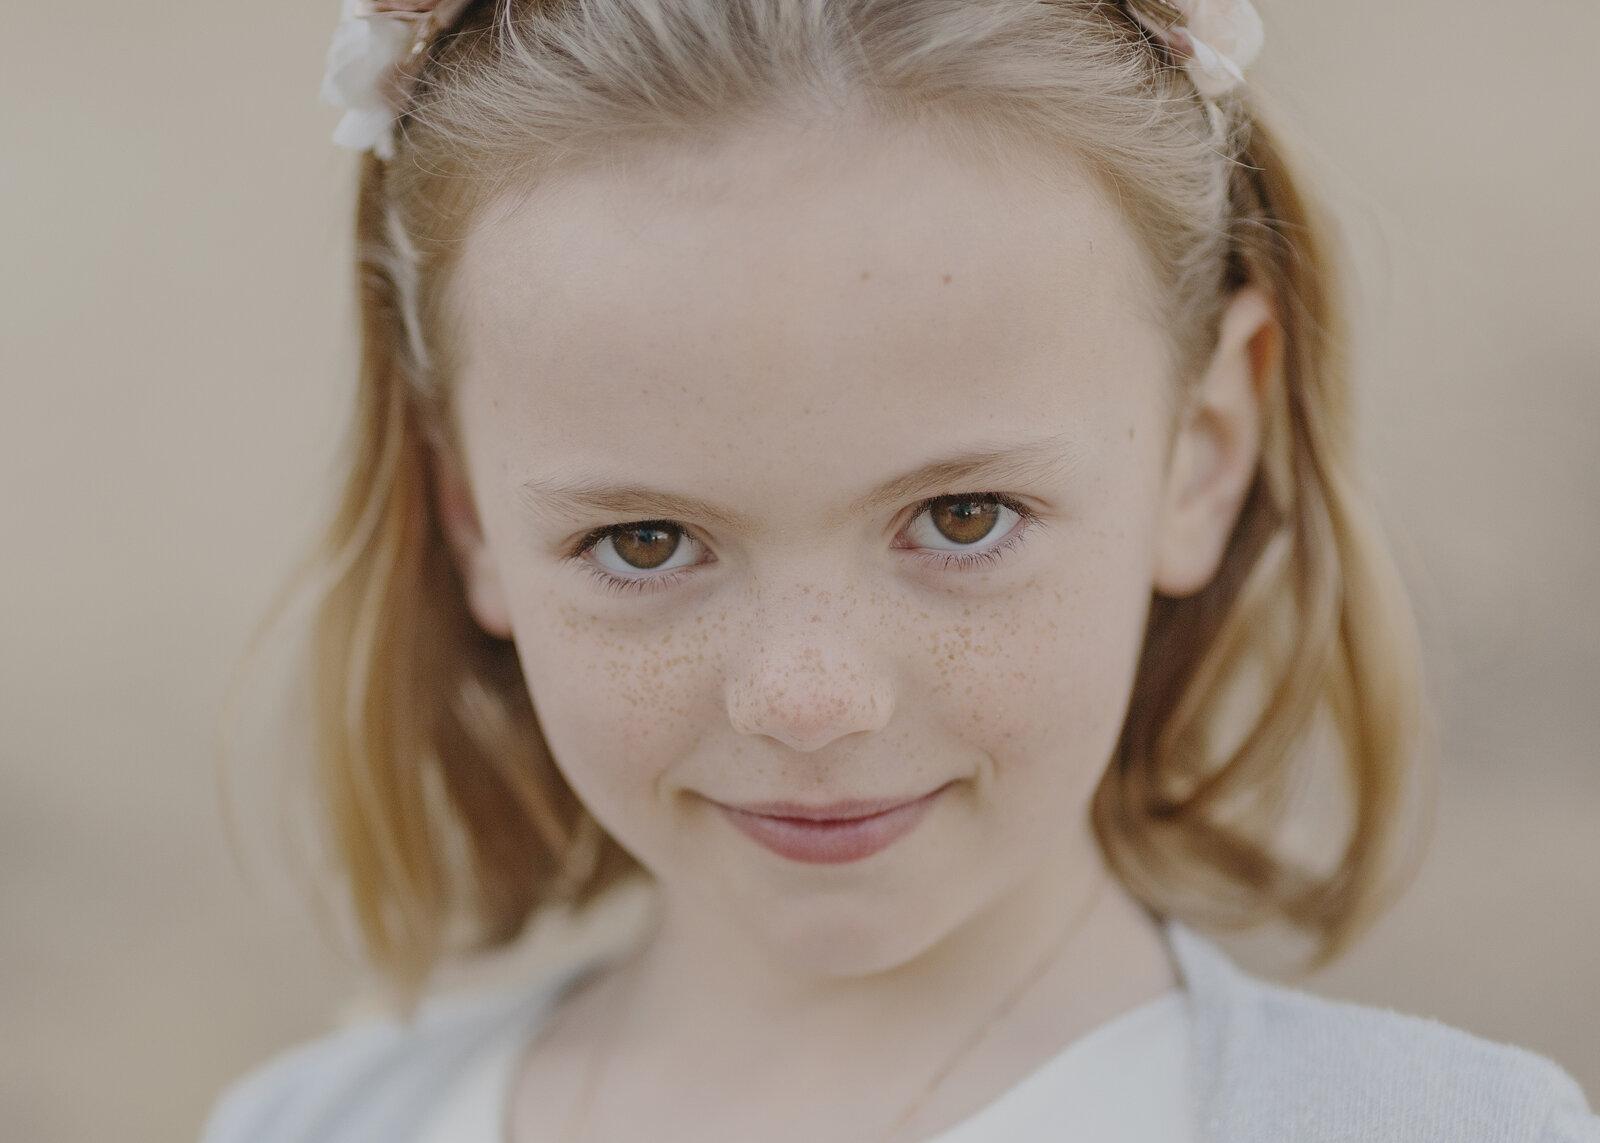 7 year old girl